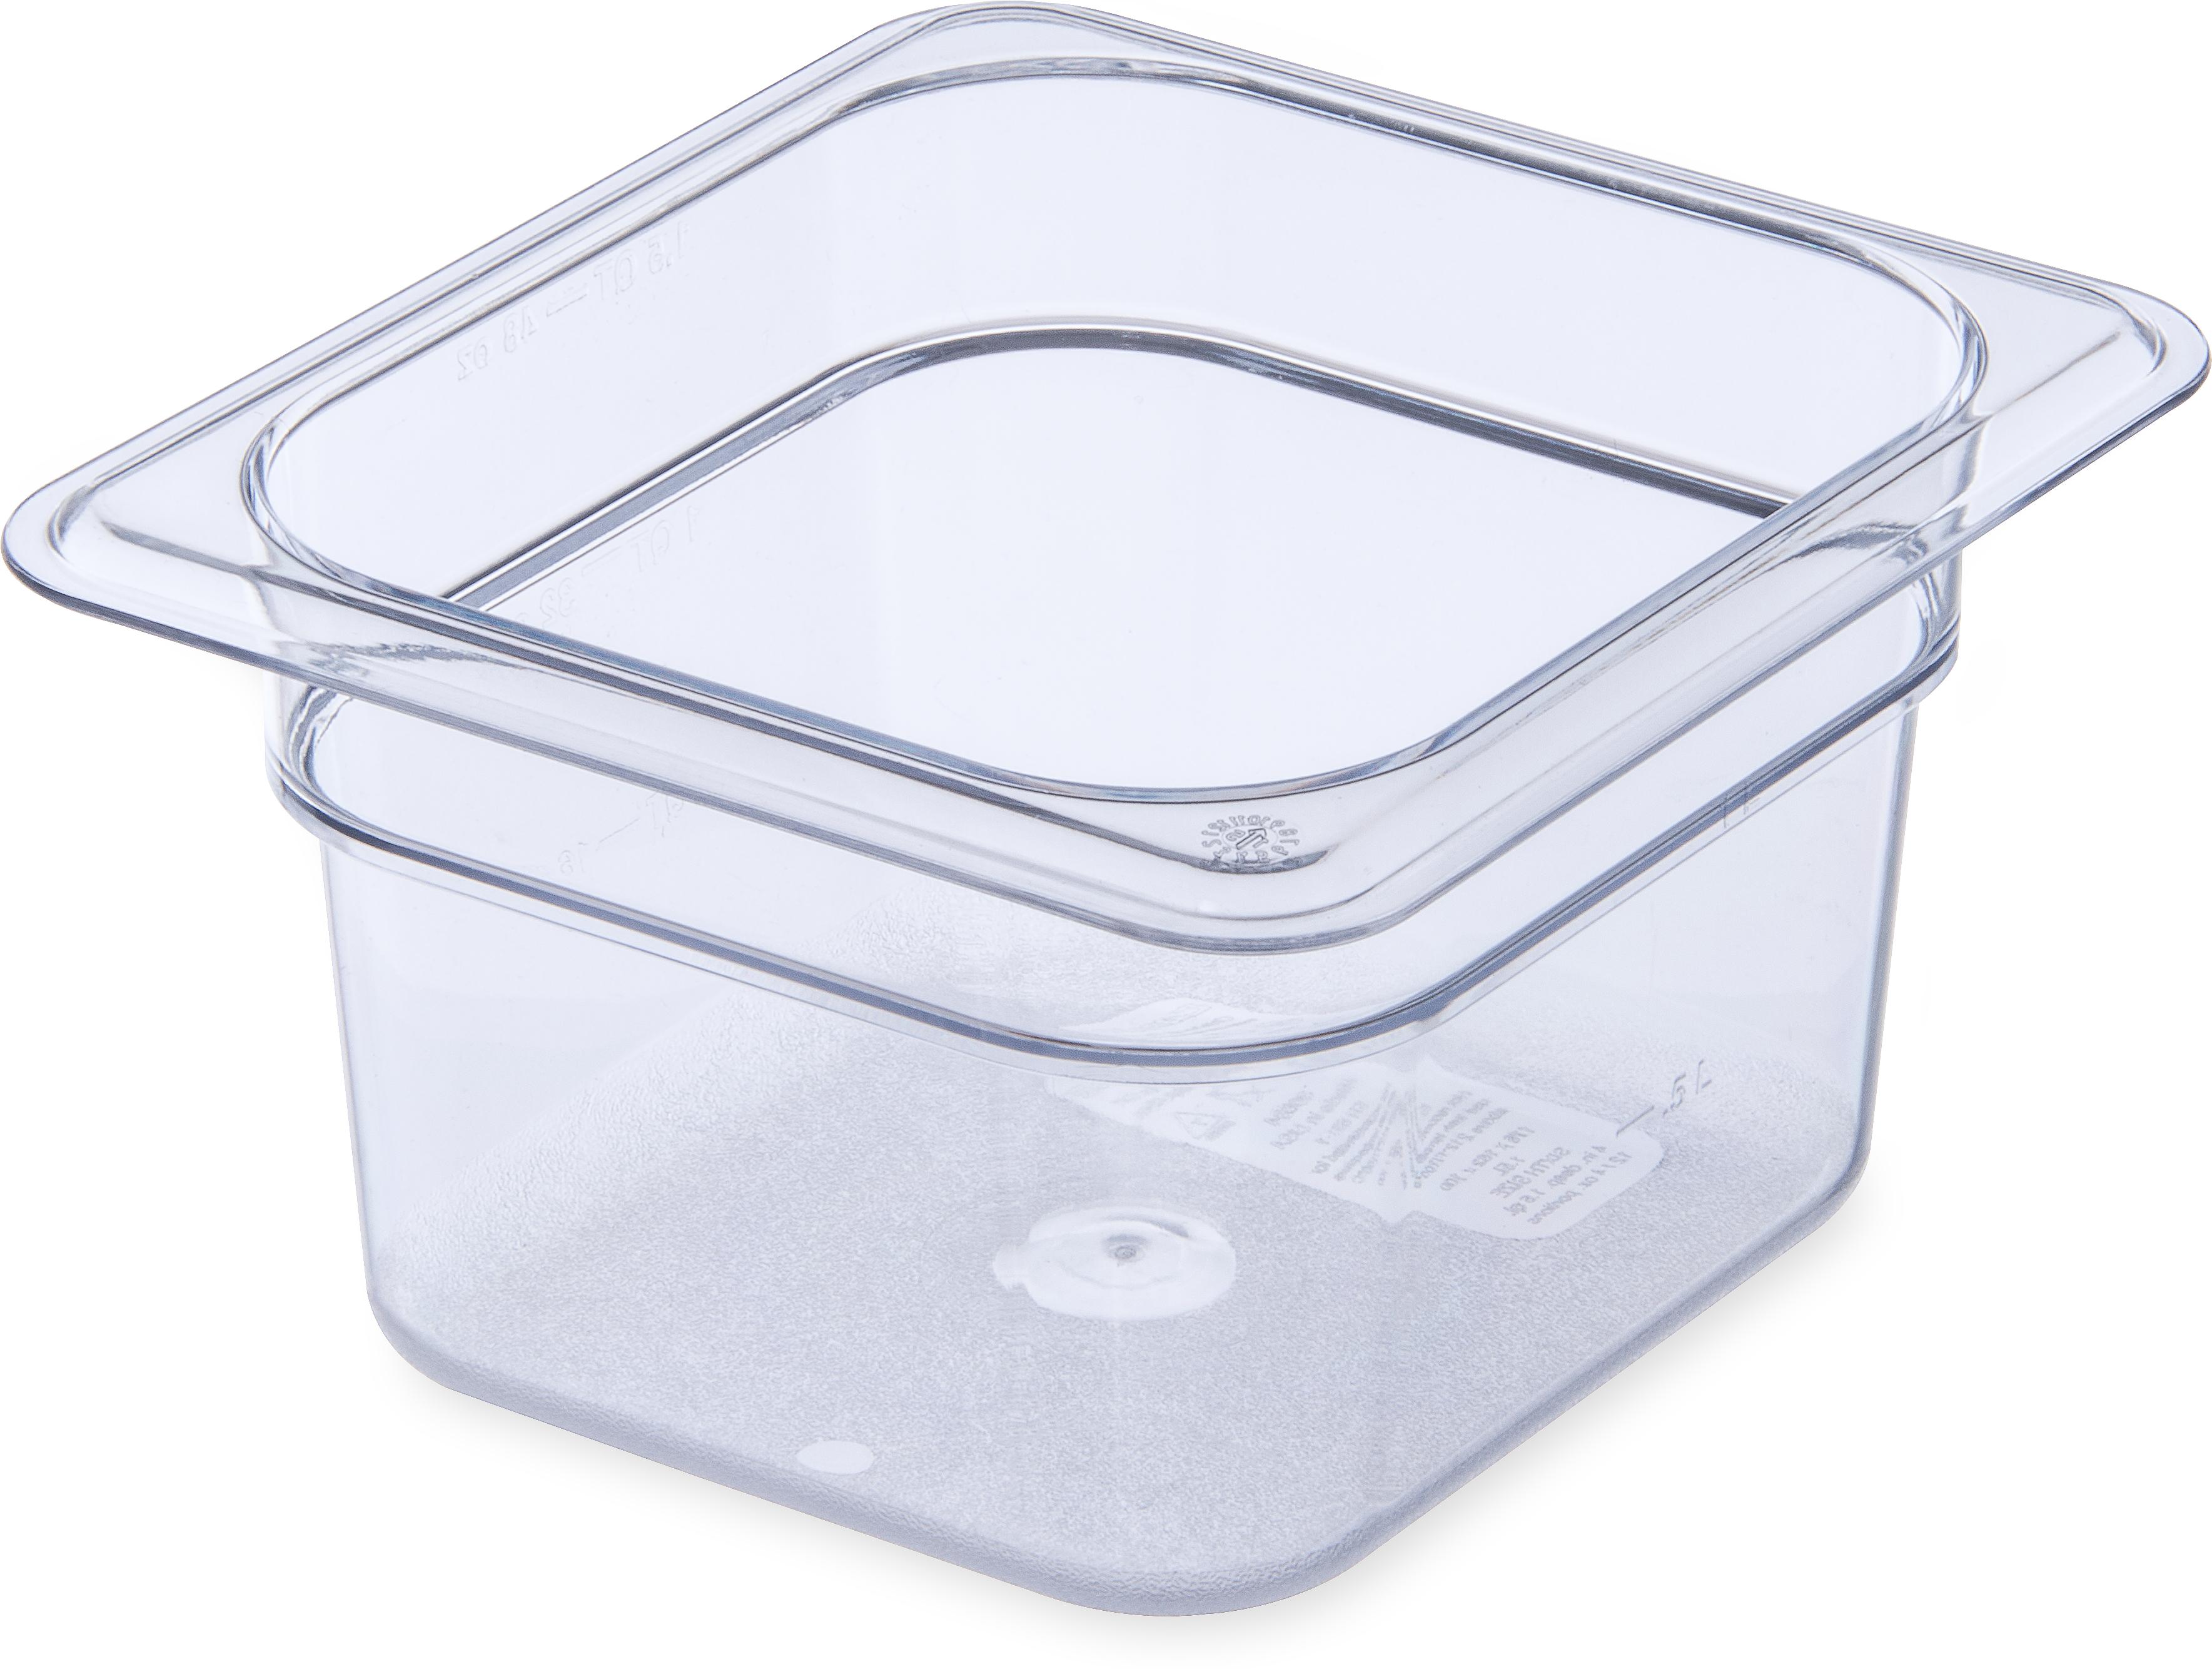 StorPlus Food Pan PC 4 DP 1/6 Size - Clear